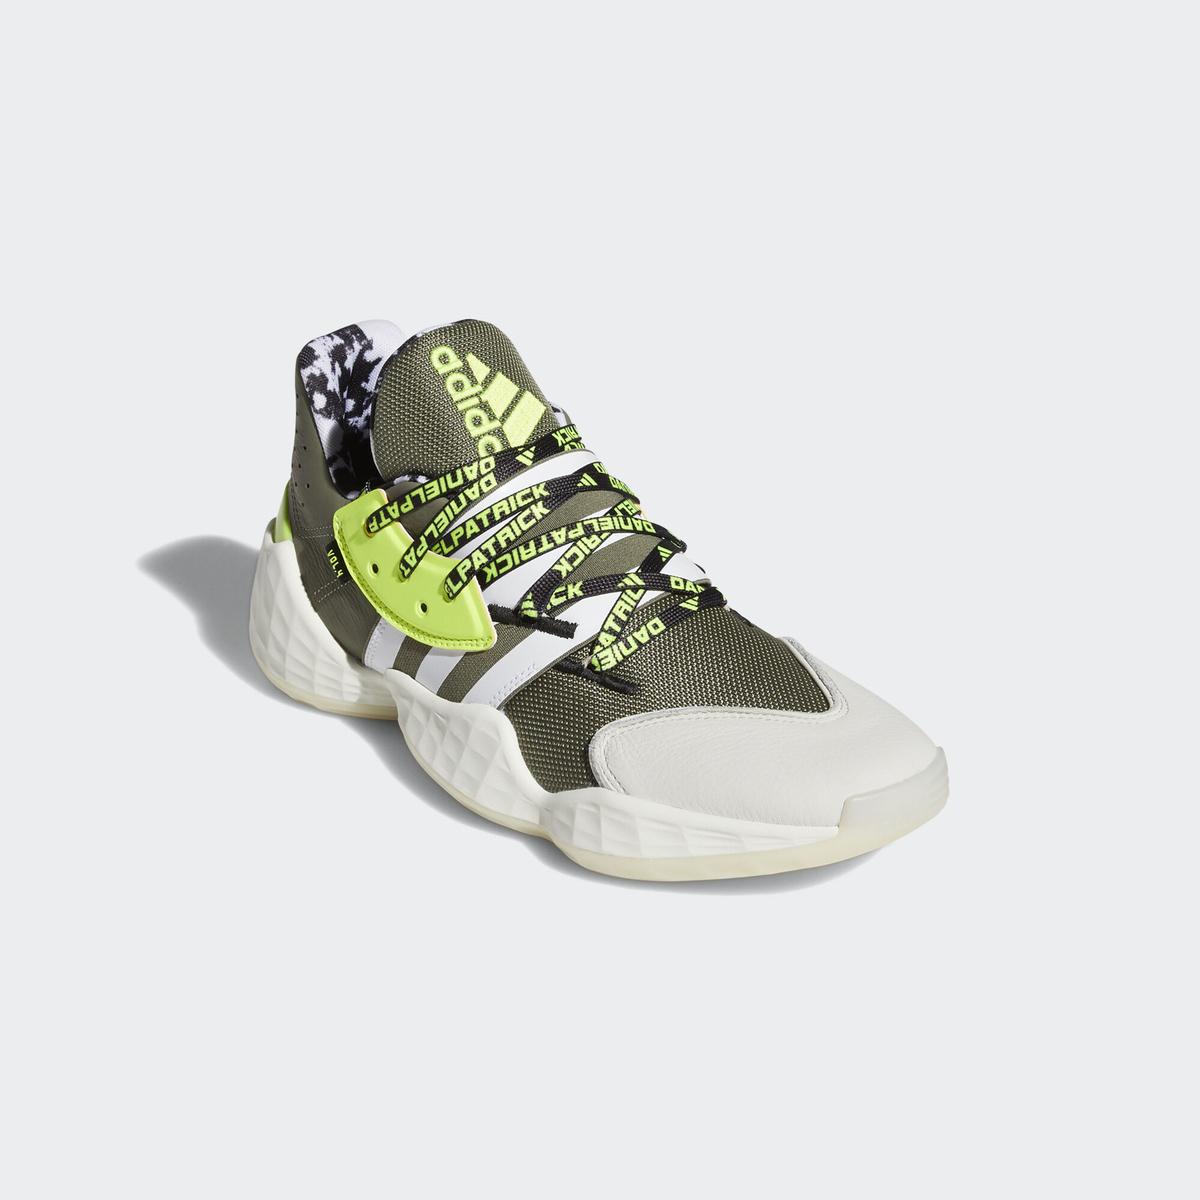 Adidas Harden Vol. 4 X Daniel Patrick